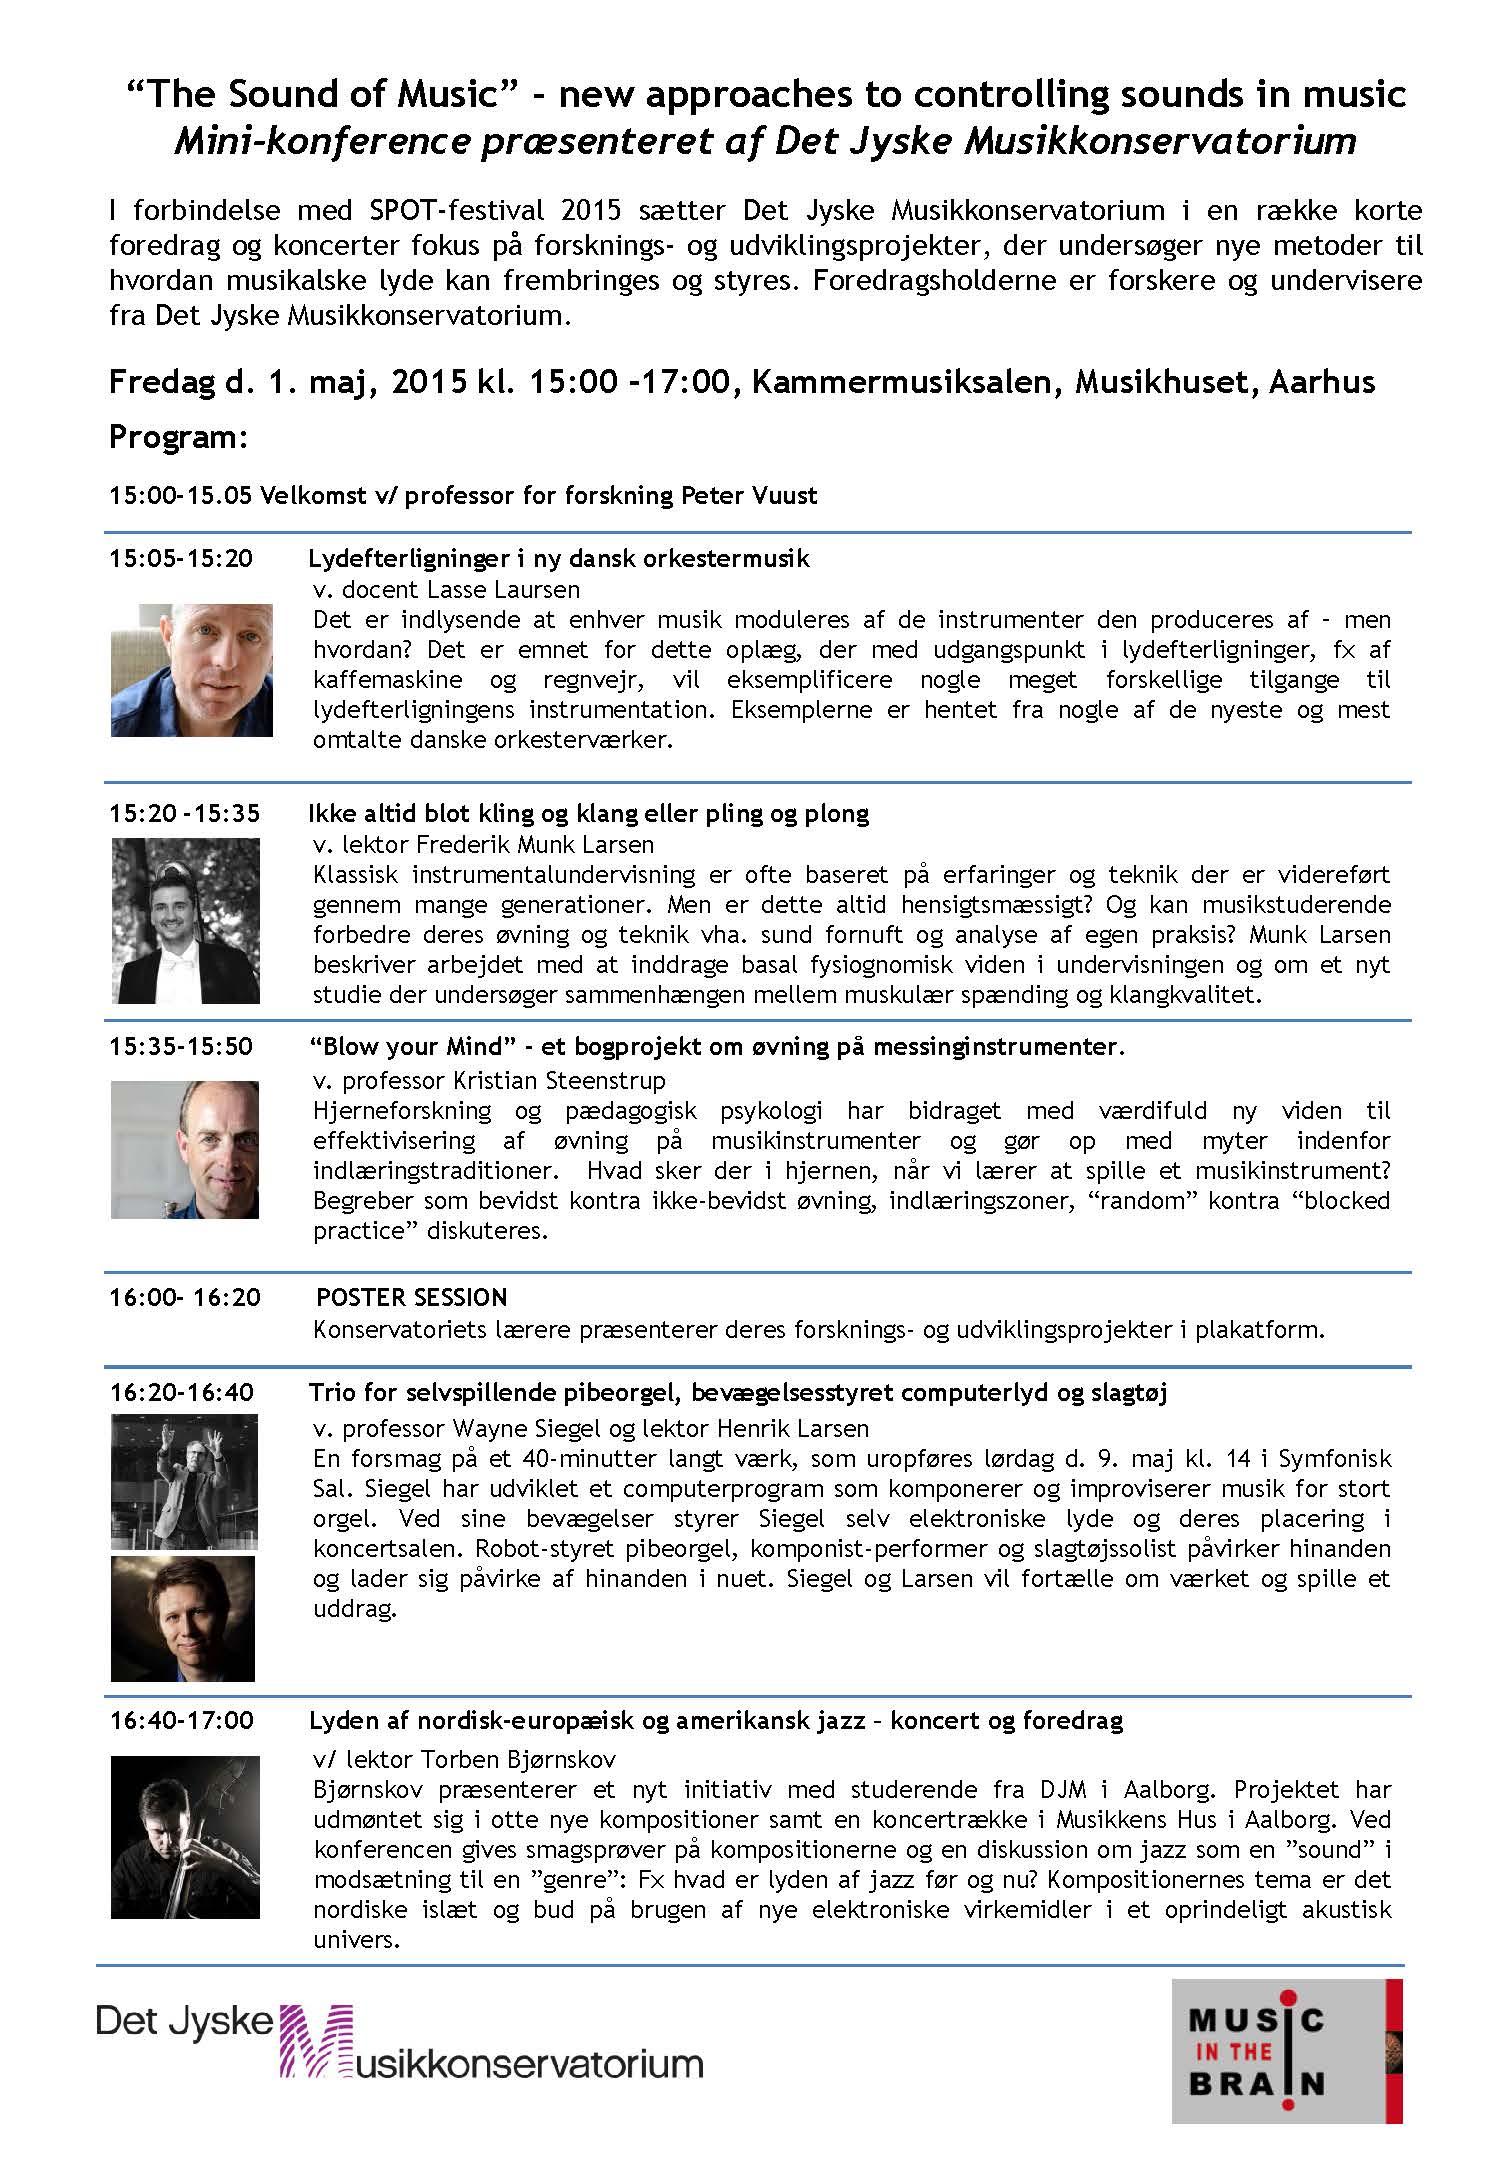 MINI konference 2015 Poster